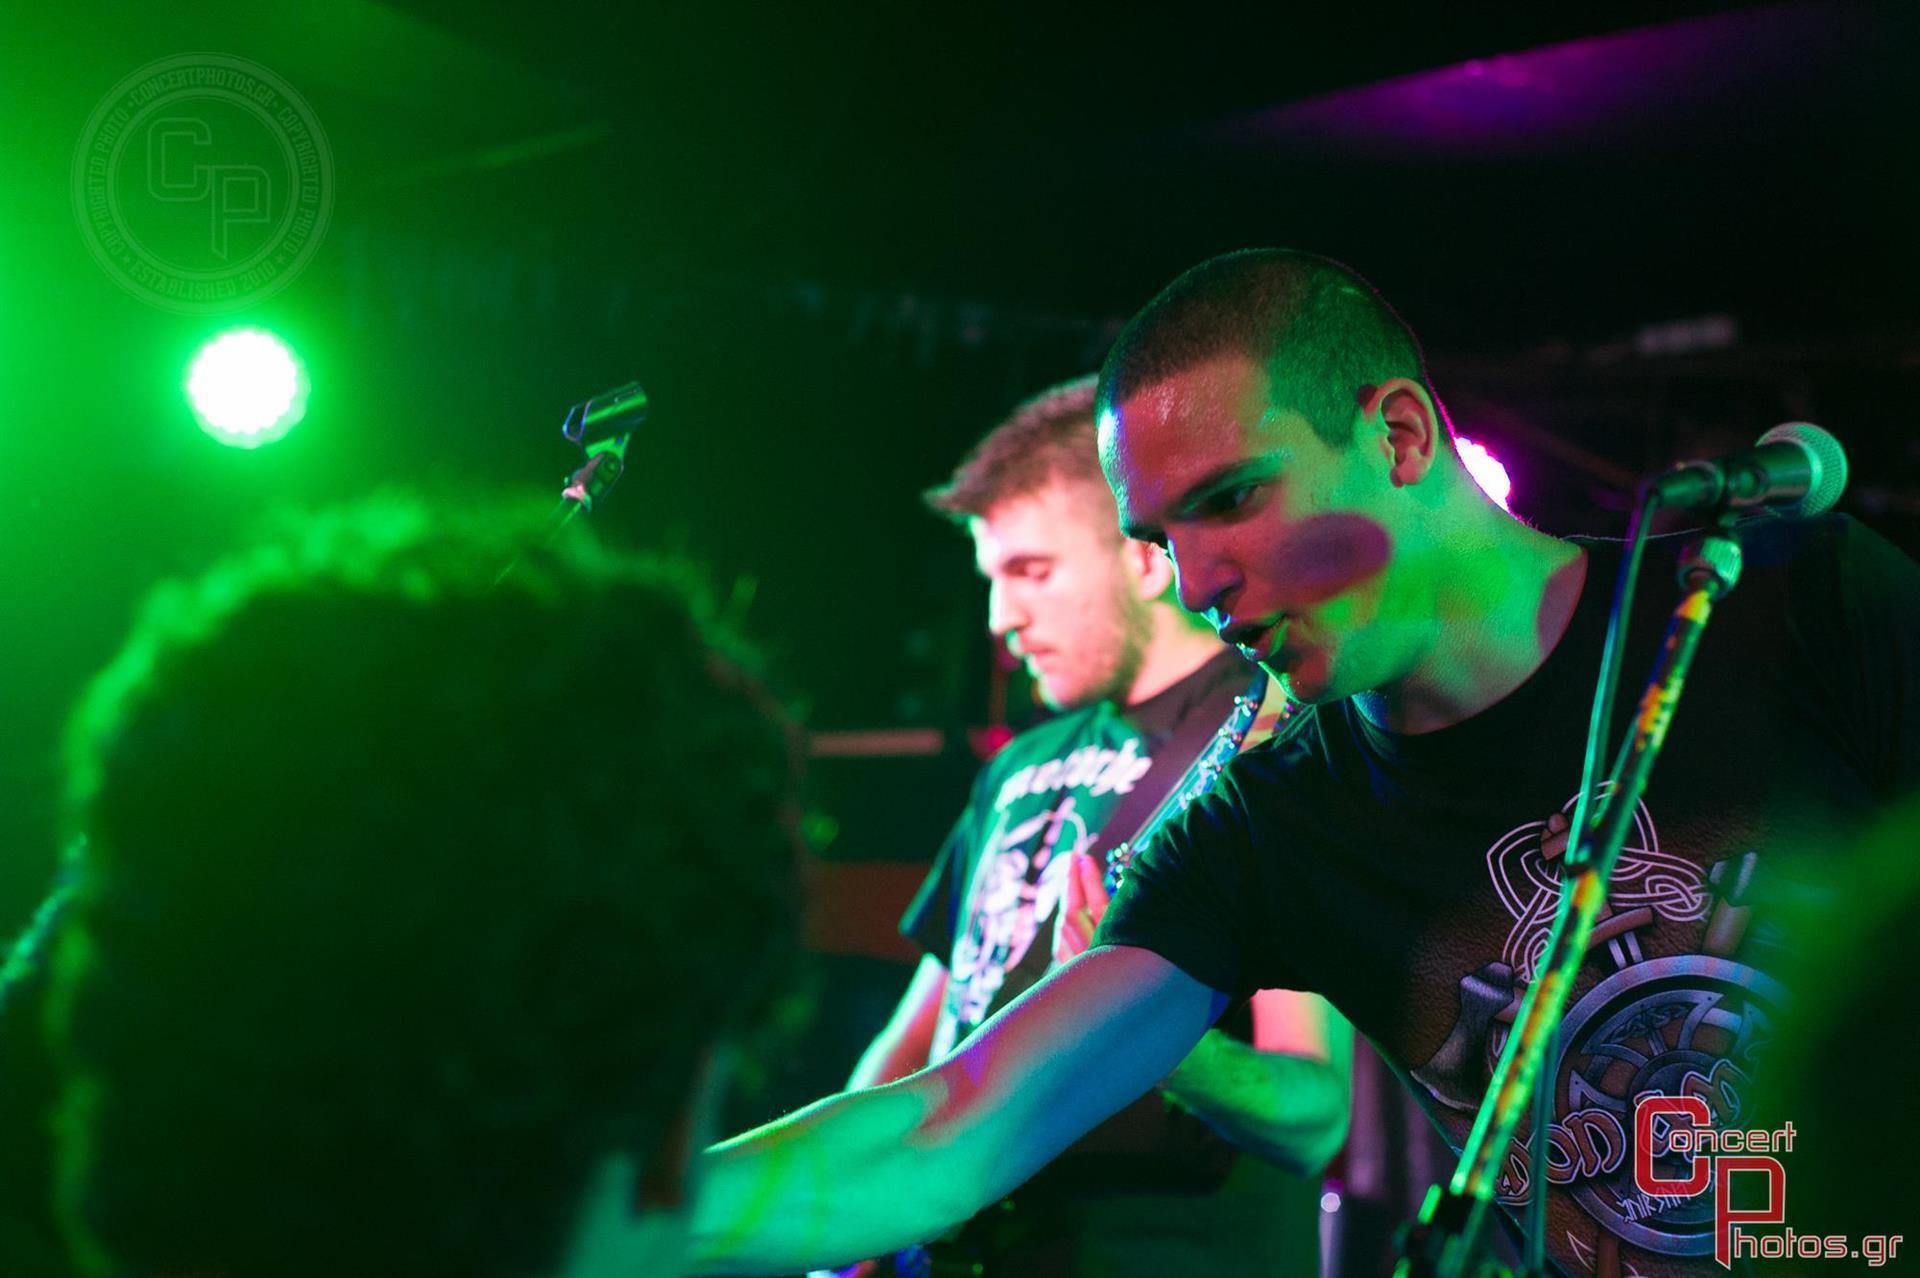 Battle Of The Bands Athens - Leg 3- photographer:  - ConcertPhotos - 20150104_2101_02